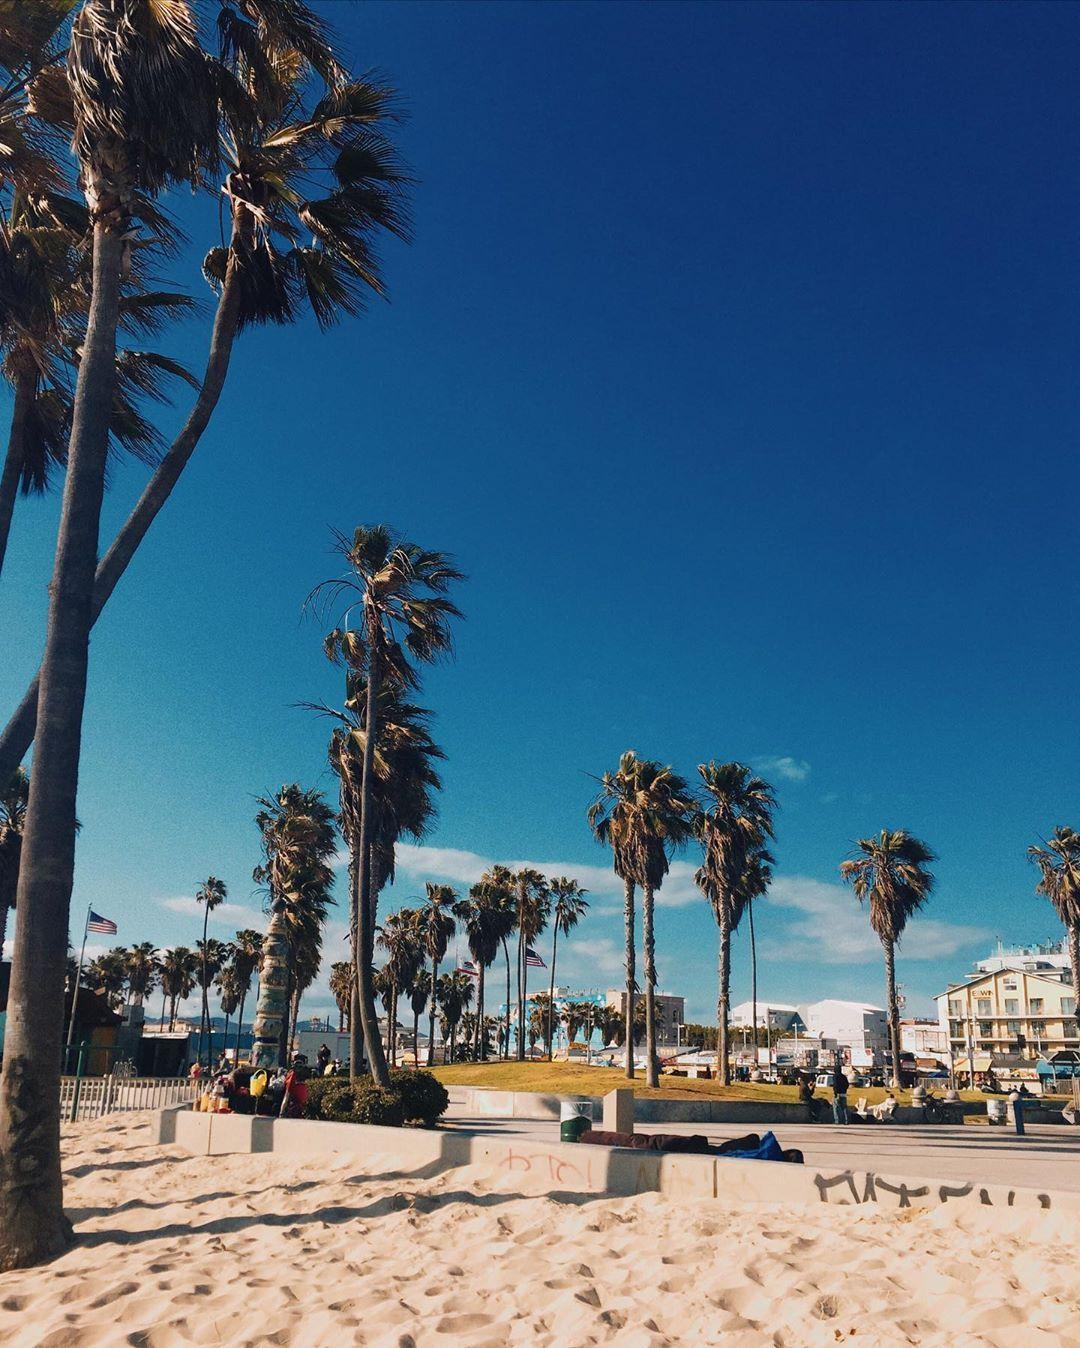 Jannikaschmidt On Instagram Throwback To My Most Favourite City Losangeles Throwback Veni In 2020 Favorite City Venice Beach Boardwalk Los Angeles Wallpaper